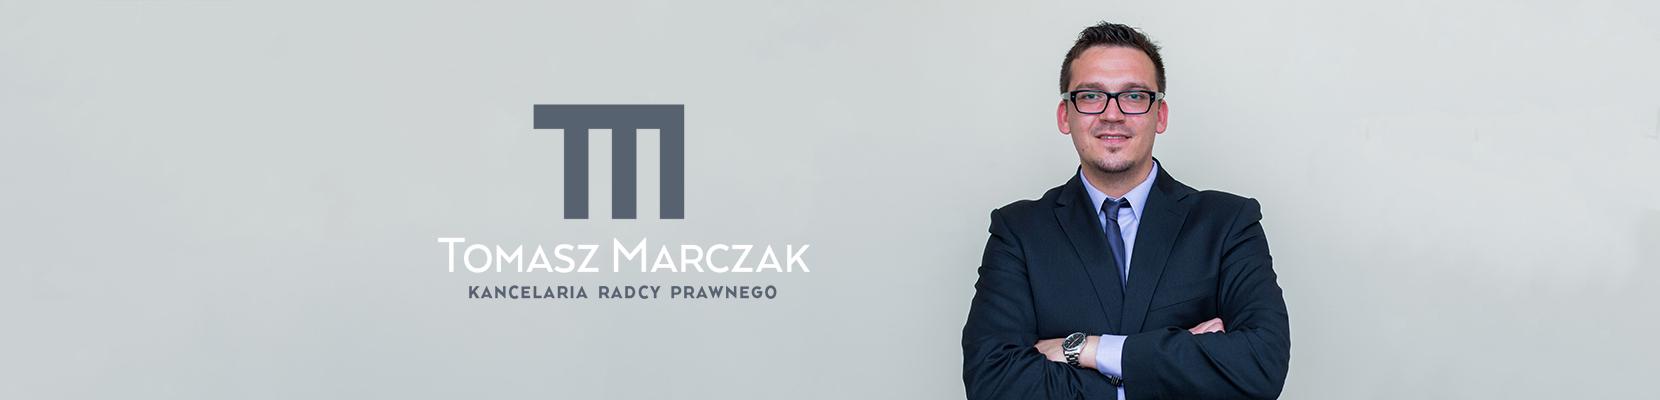 Kancelaria Tomasz Marczak